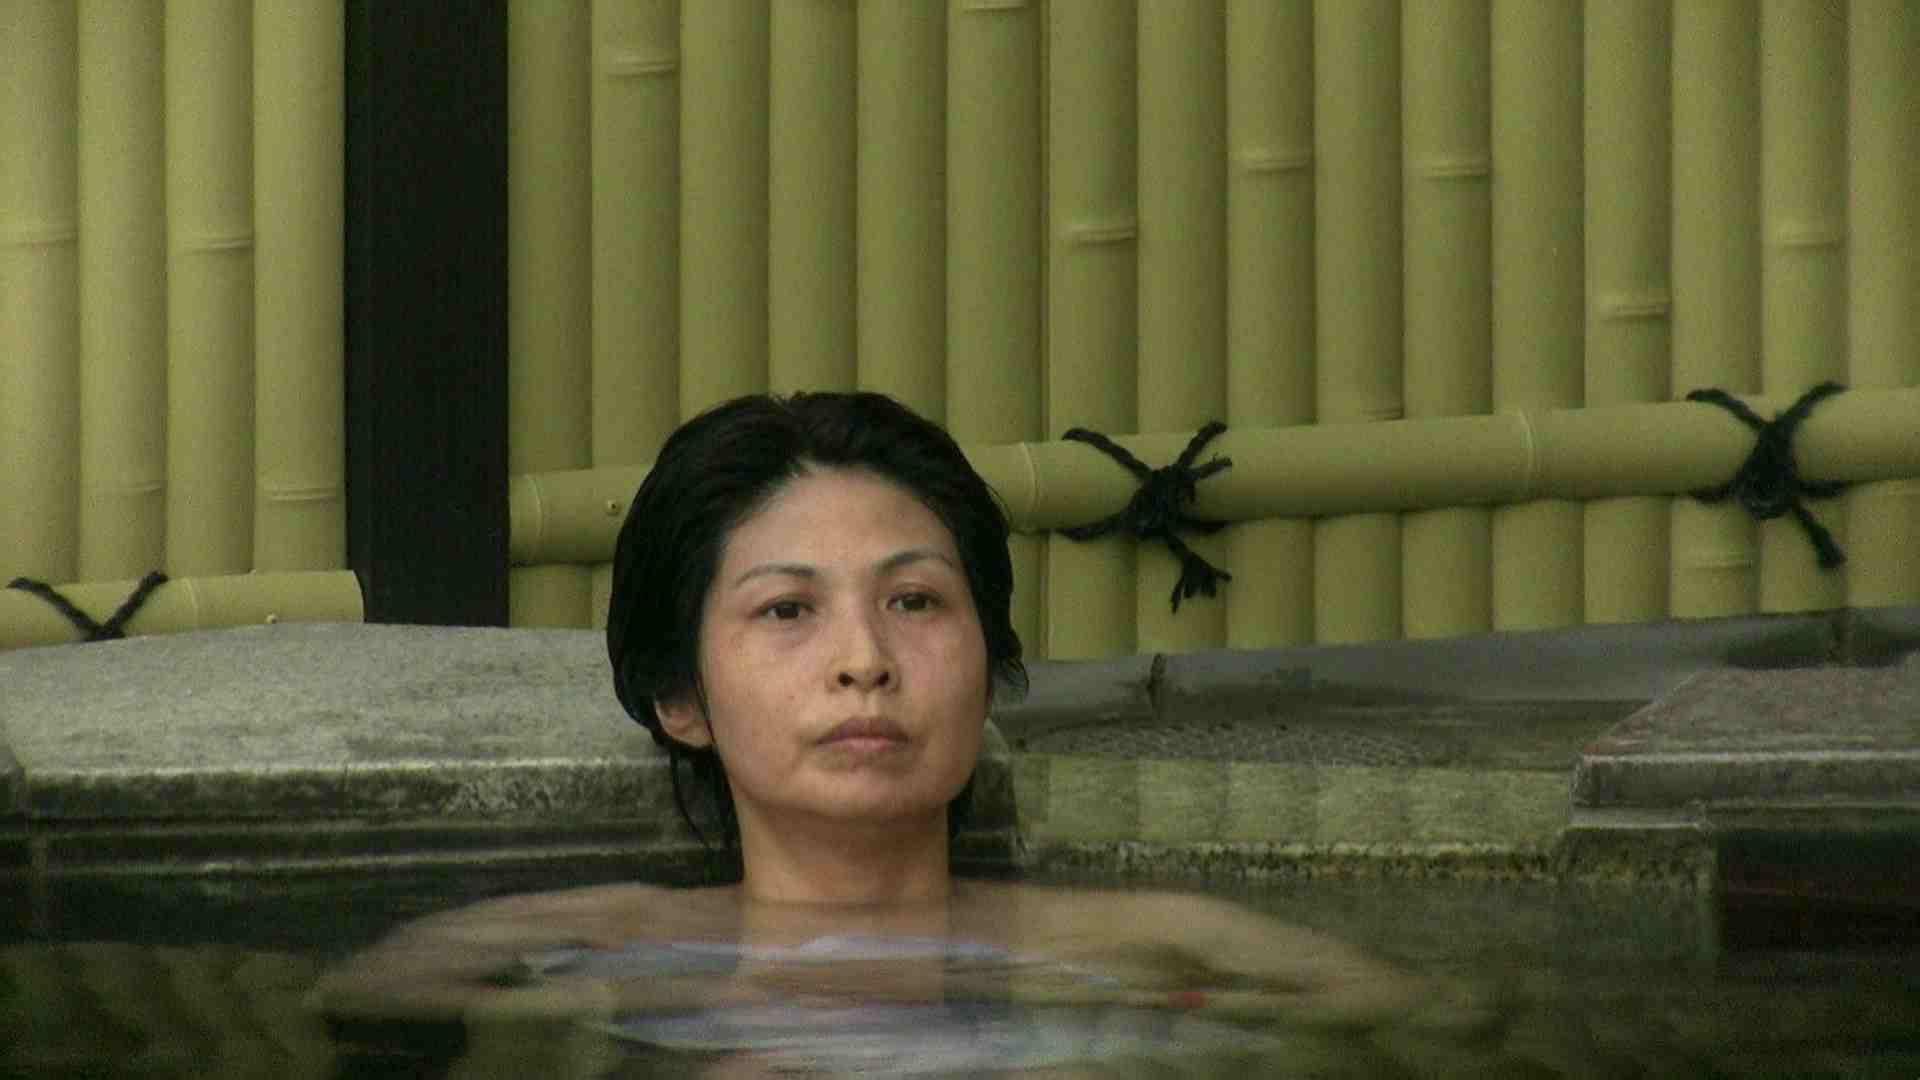 Aquaな露天風呂Vol.636 OL女体 | 露天  87連発 28